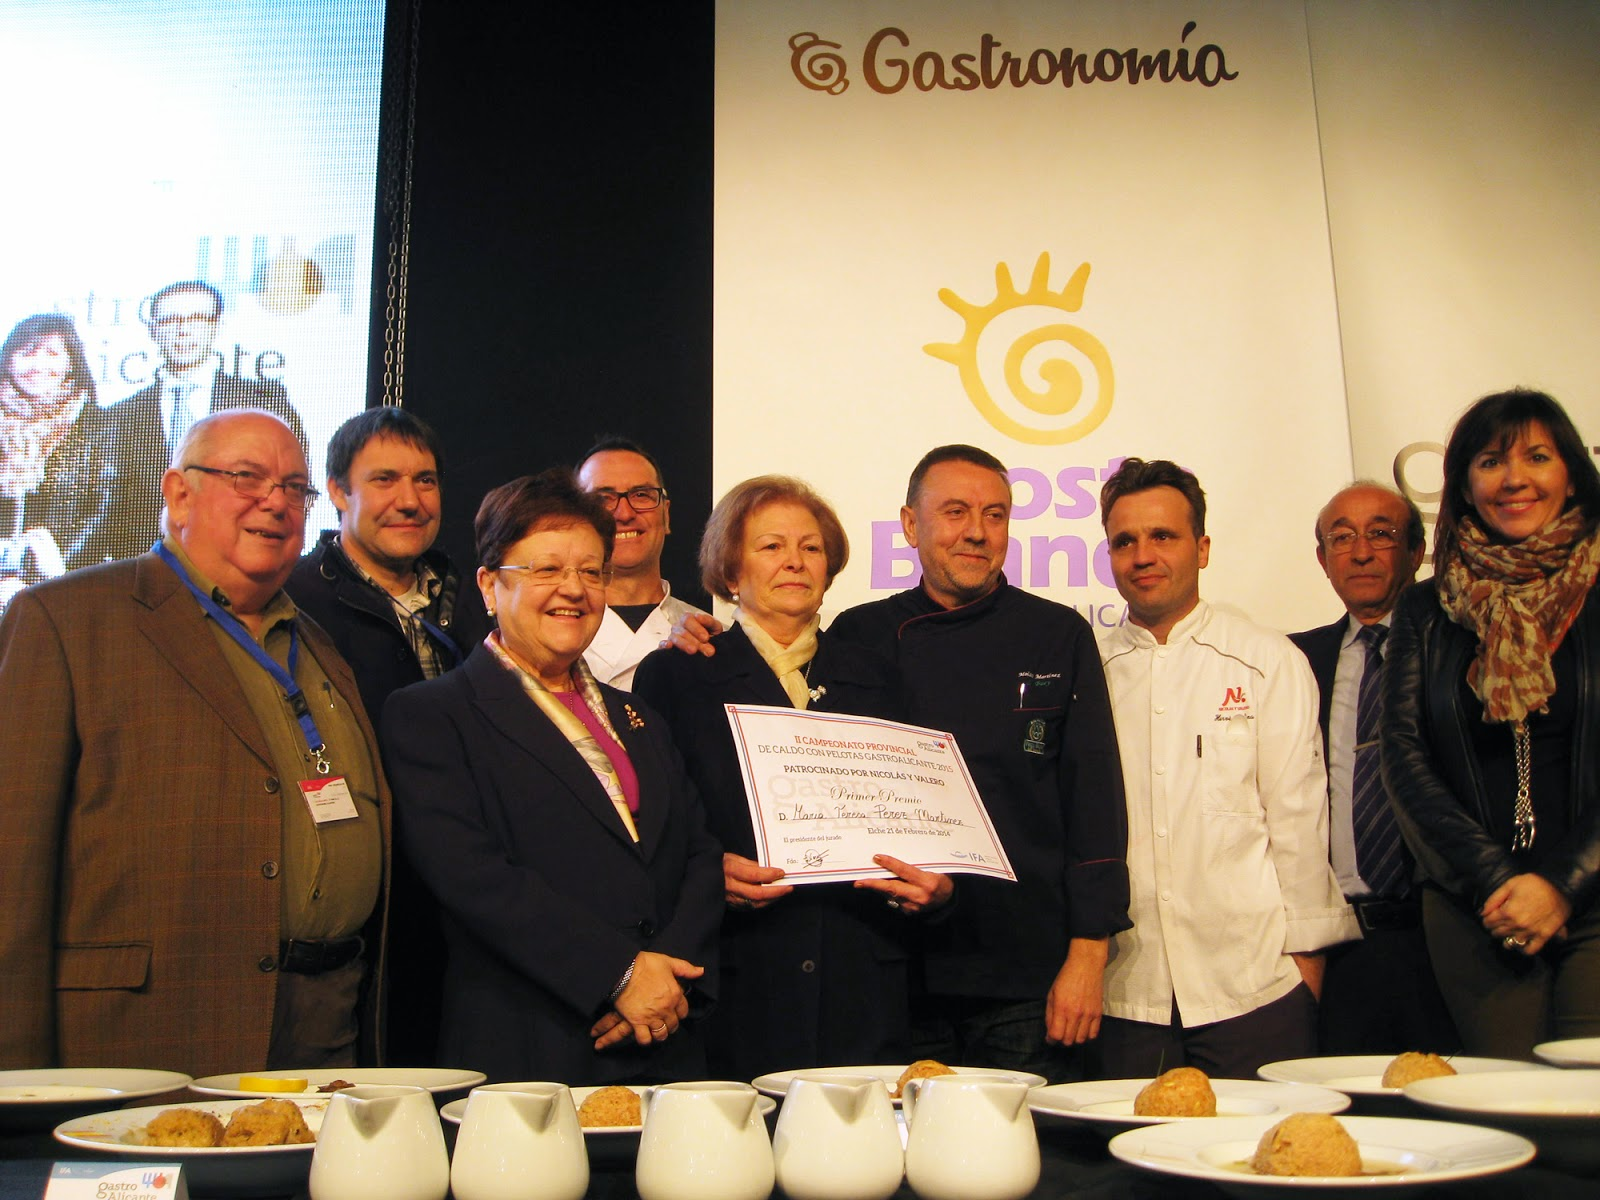 GastroAlicante 2015 - Concurso Caldo Pelotas